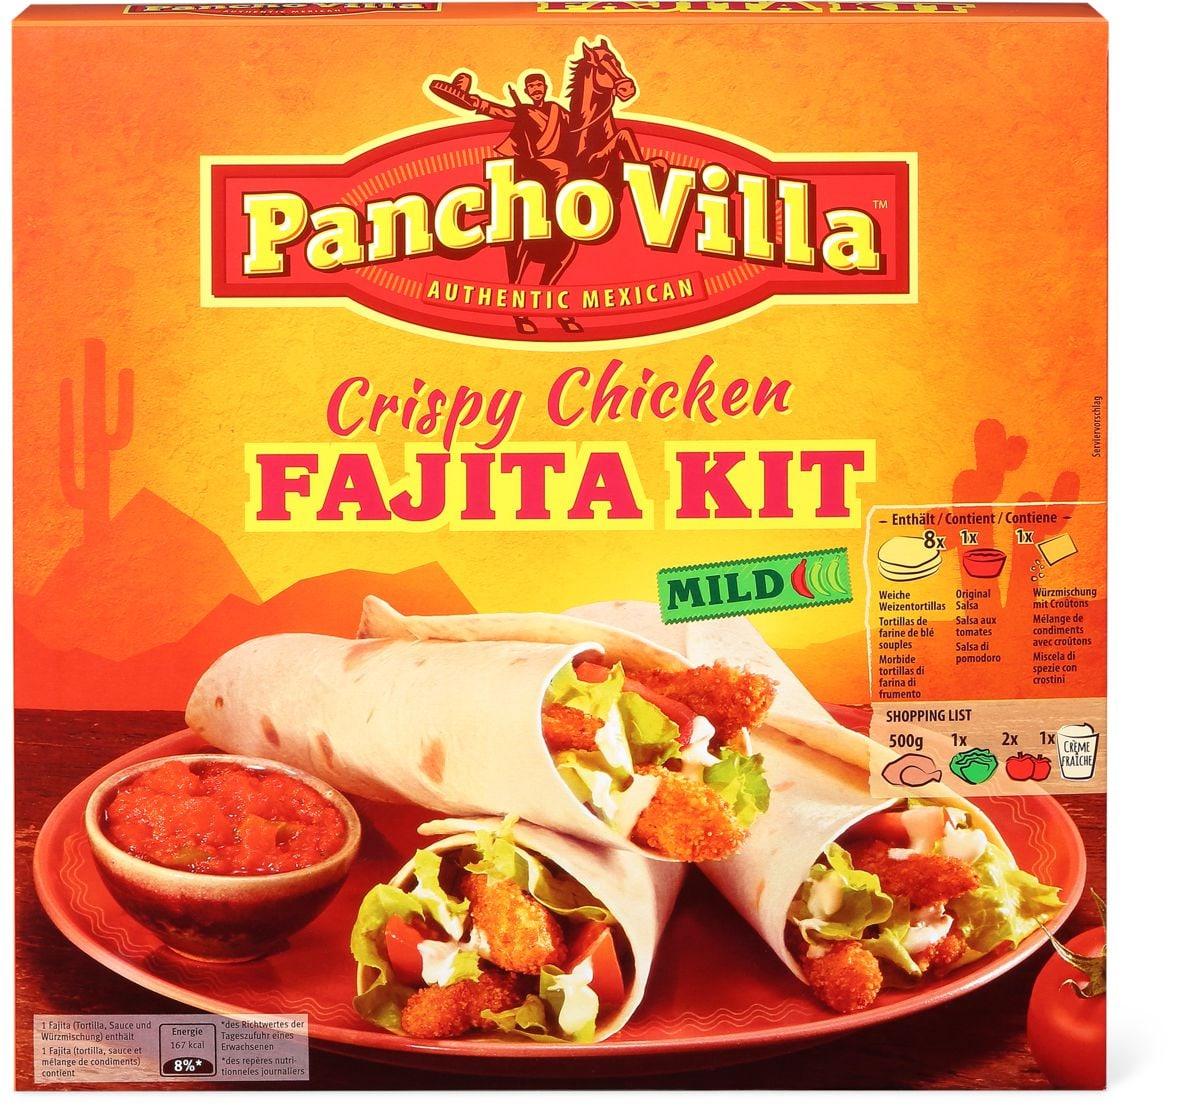 Pancho Villa Crispy Chicken Fajita Kit